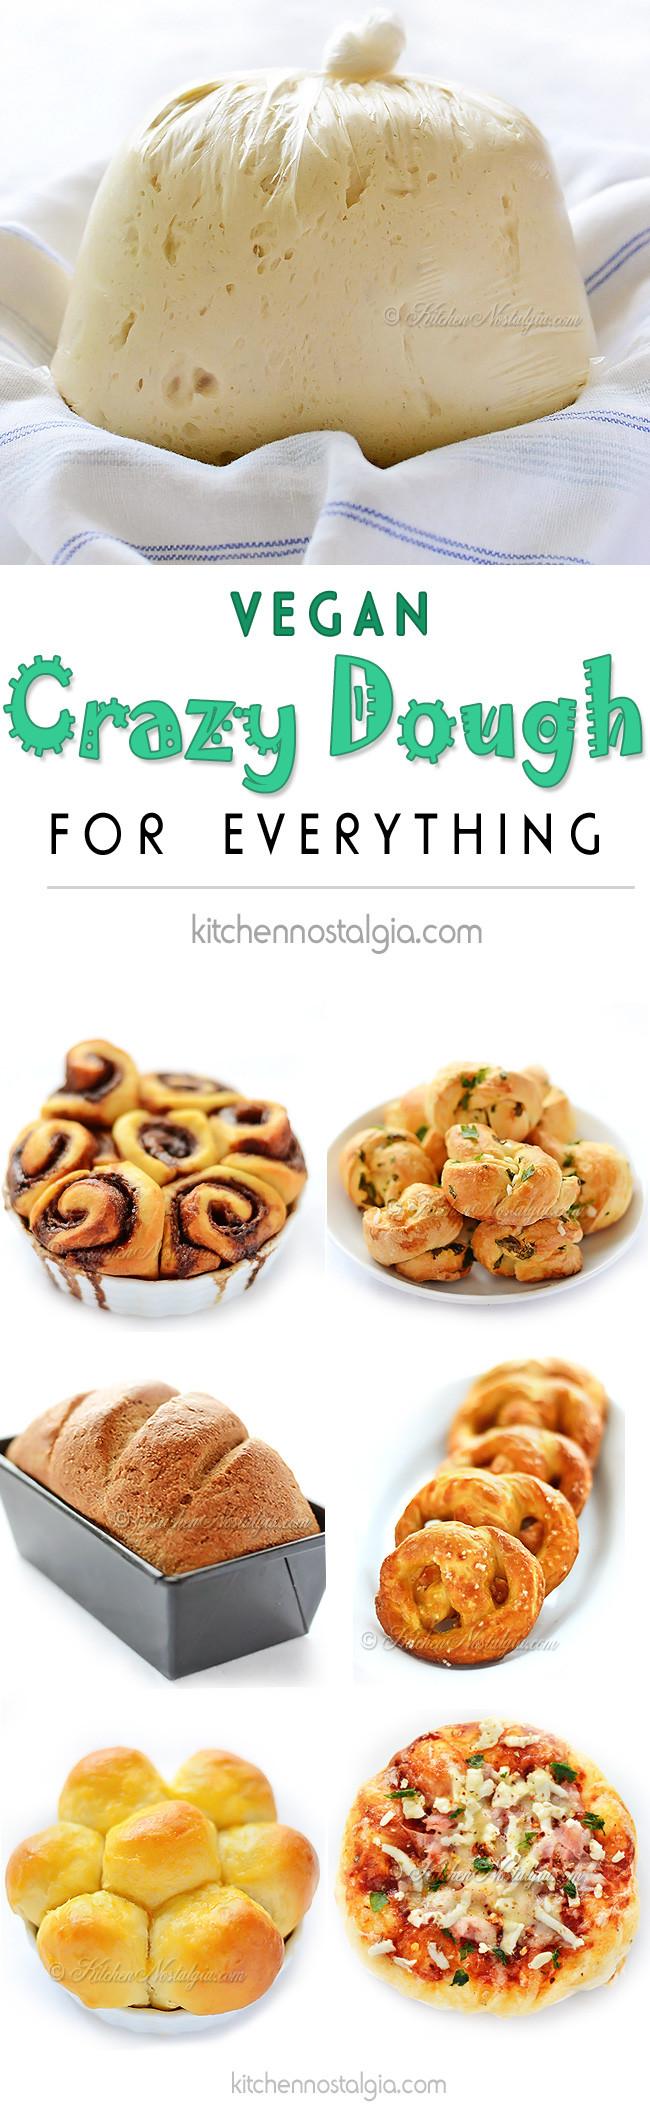 Vegan Bread Brands  vegan cinnamon bread brands